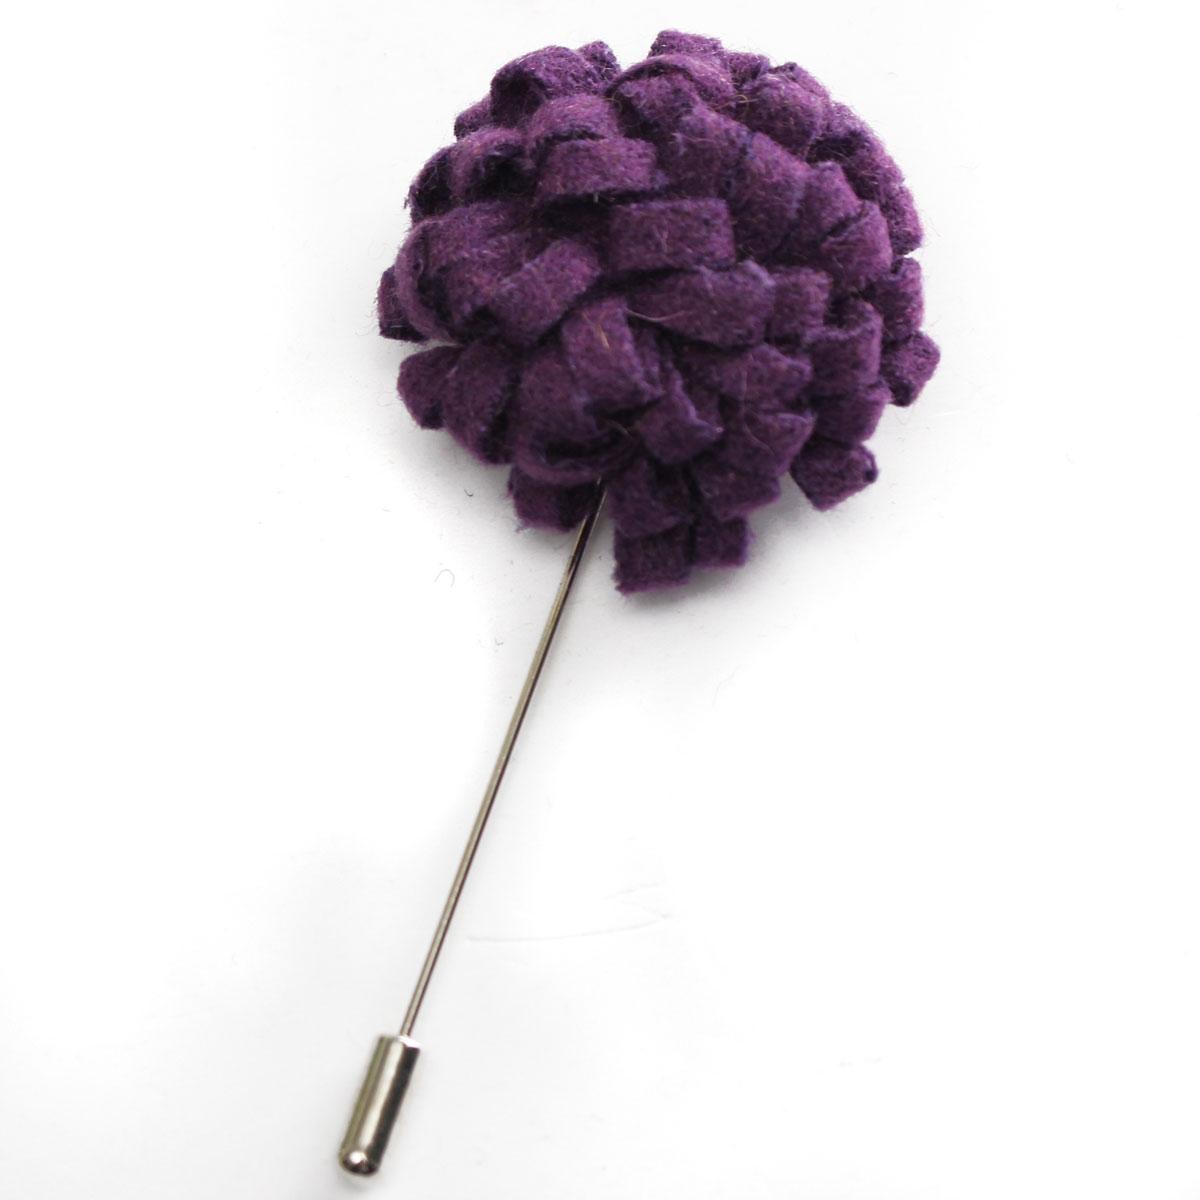 Men Wool Felt Lapel Flower Stick Pin Brooch Boutonniere Wedding Party Tuxedo